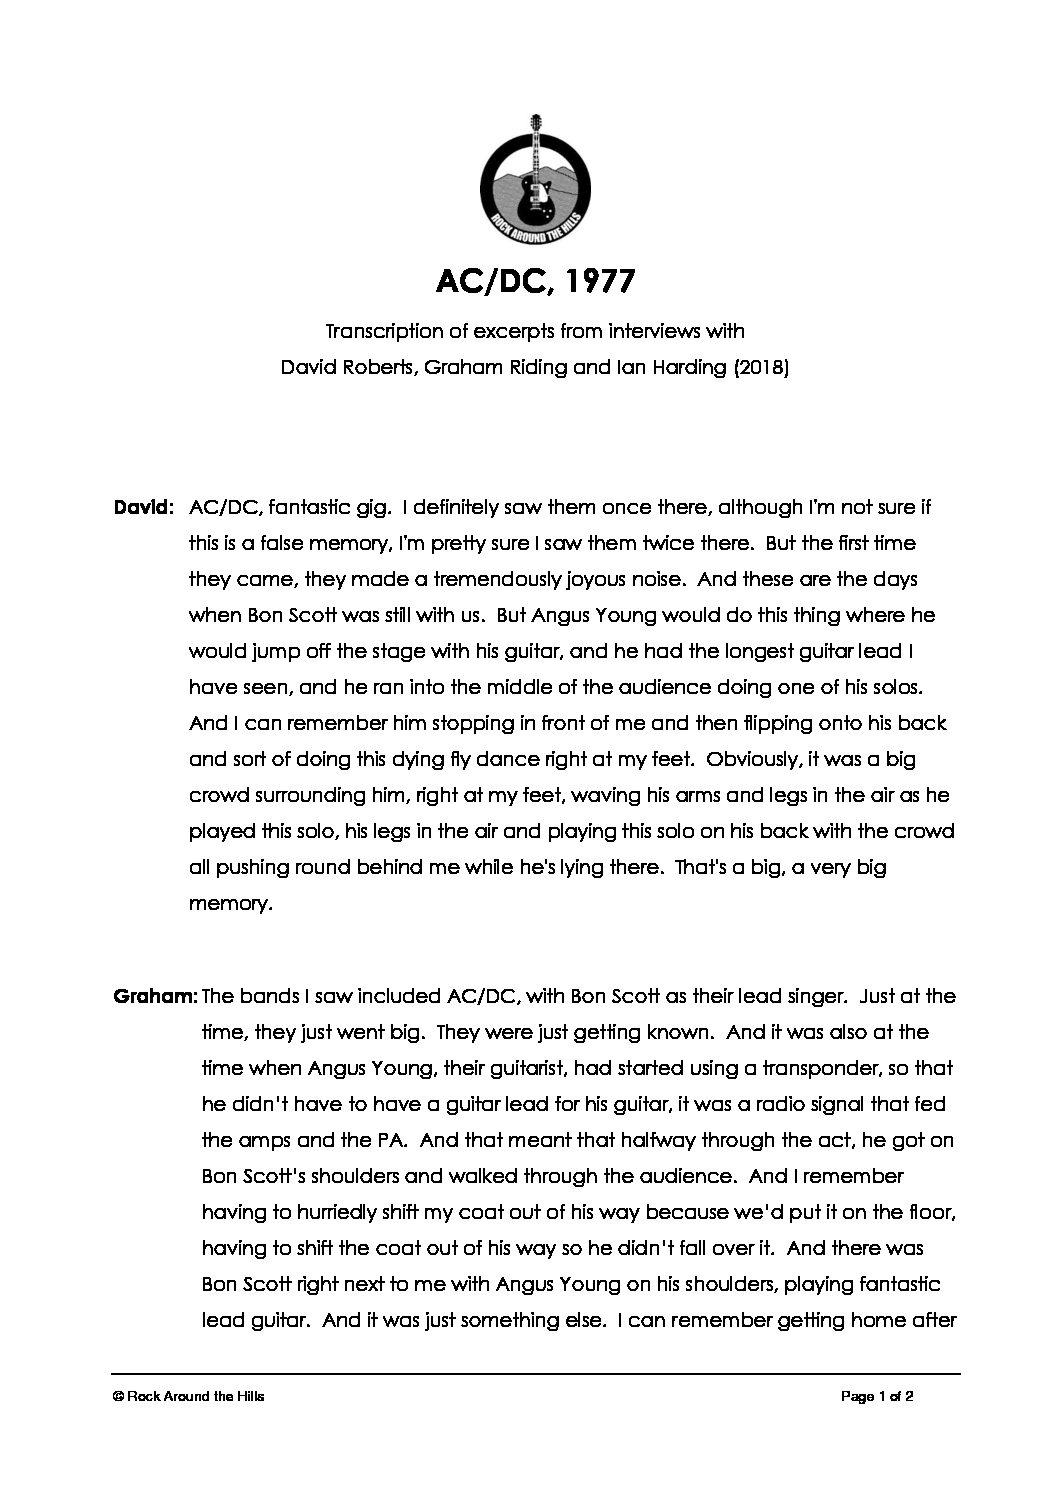 Memories of AC/DC at Malvern Winter Gardens, 1977